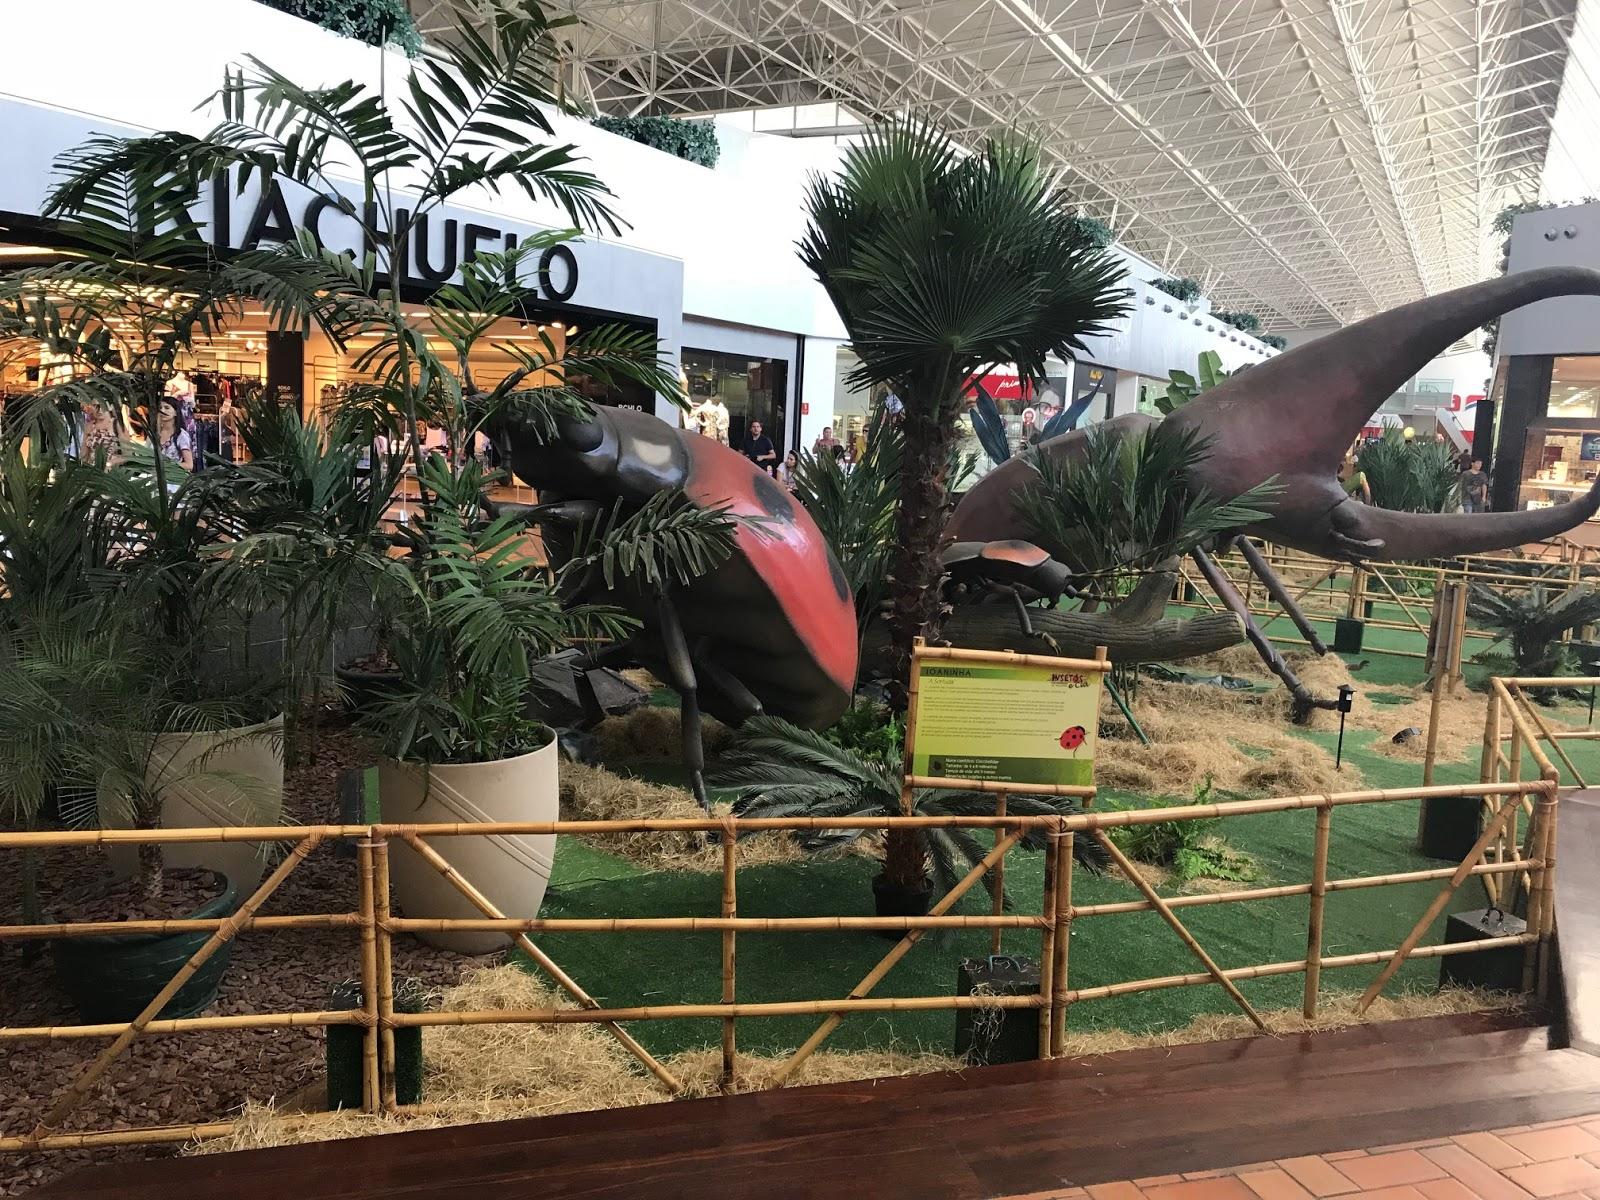 Iguatemi Fortaleza expõe insetos gigantes 4c279a382a1e6